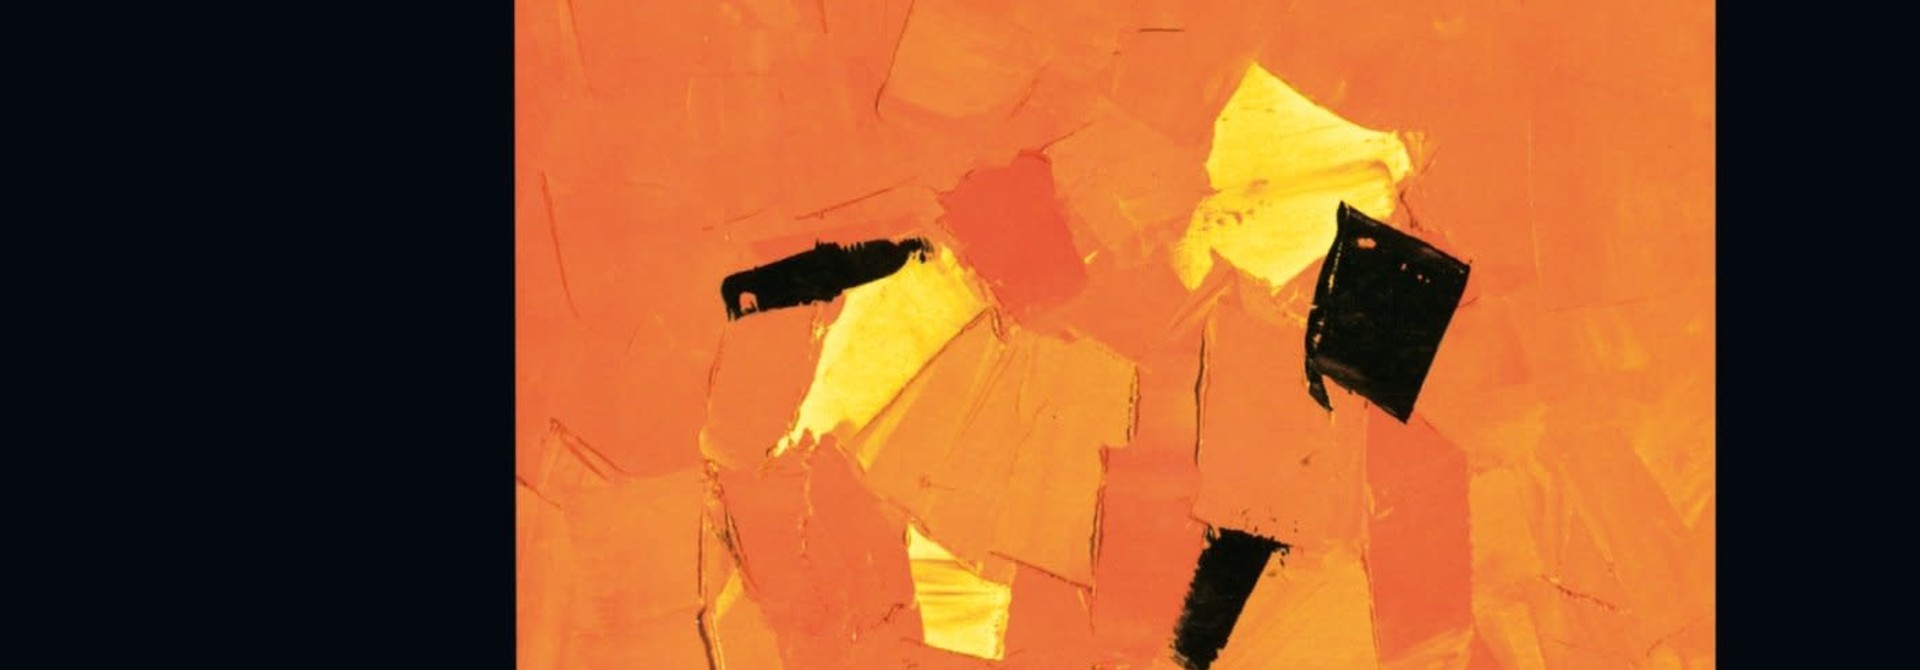 Stan Getz / Joao Gilberto Featuring Antonio Carlos Jobim • Getz / Gilberto